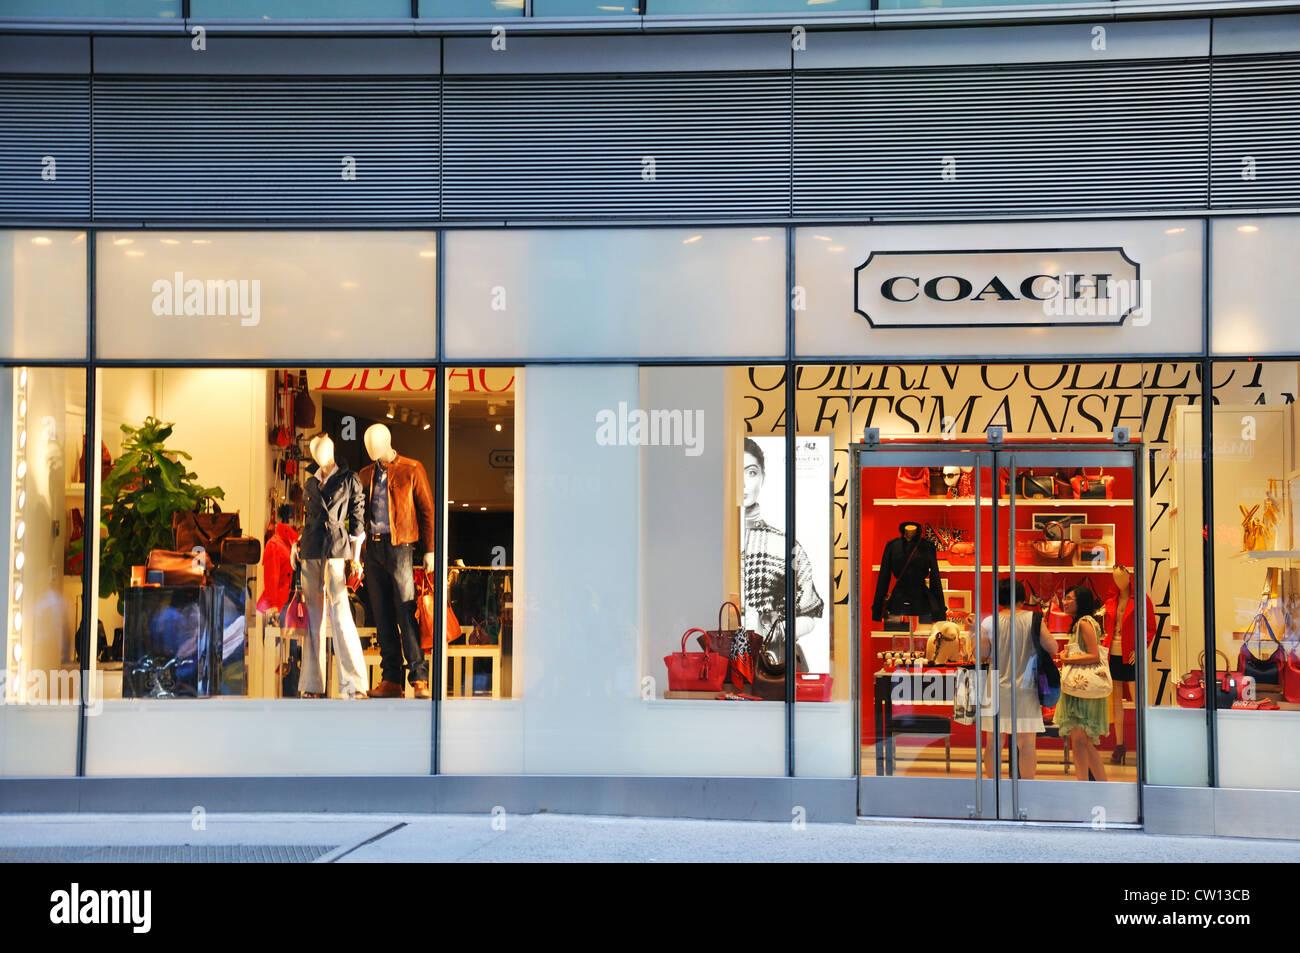 coach apparel outlet 6dk4  Coach designer handbag store, New York, USA